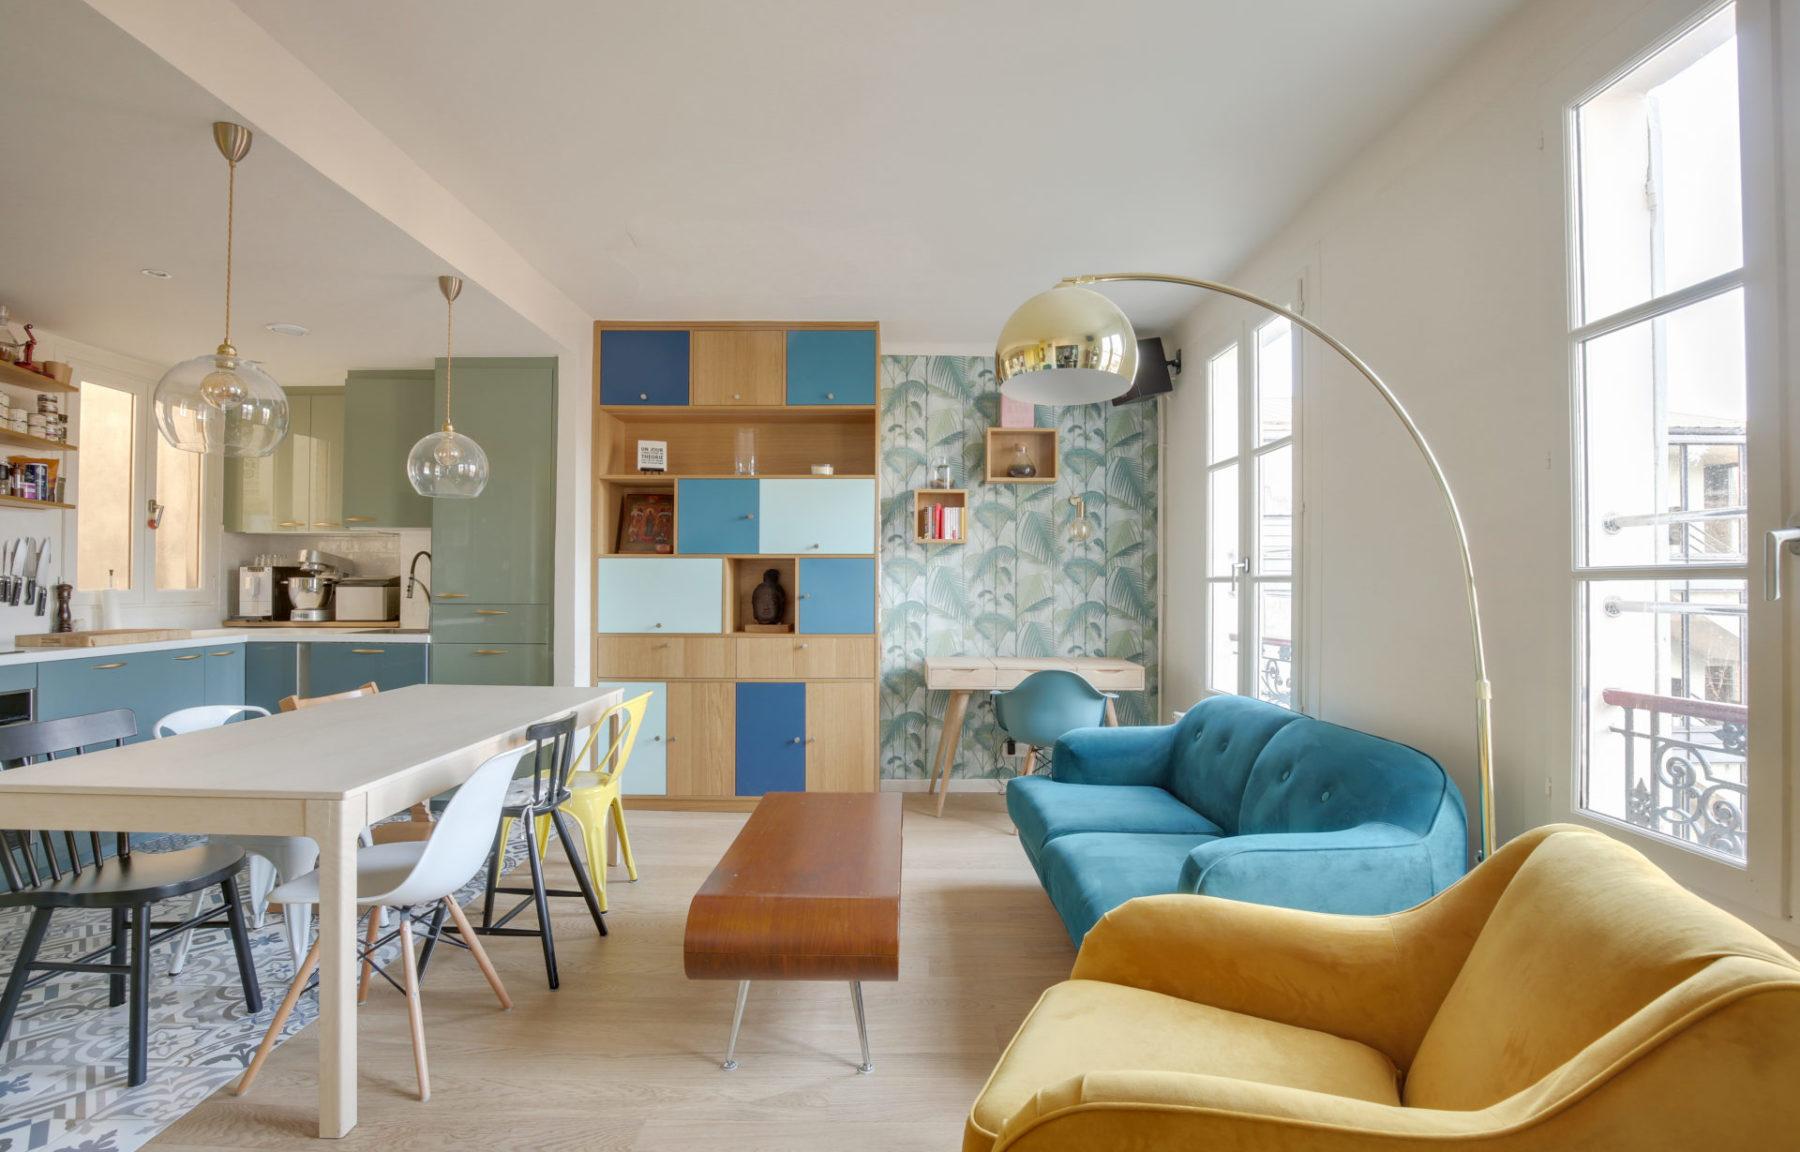 https://ldco-paris.fr/project/rue-des-petits-champs/